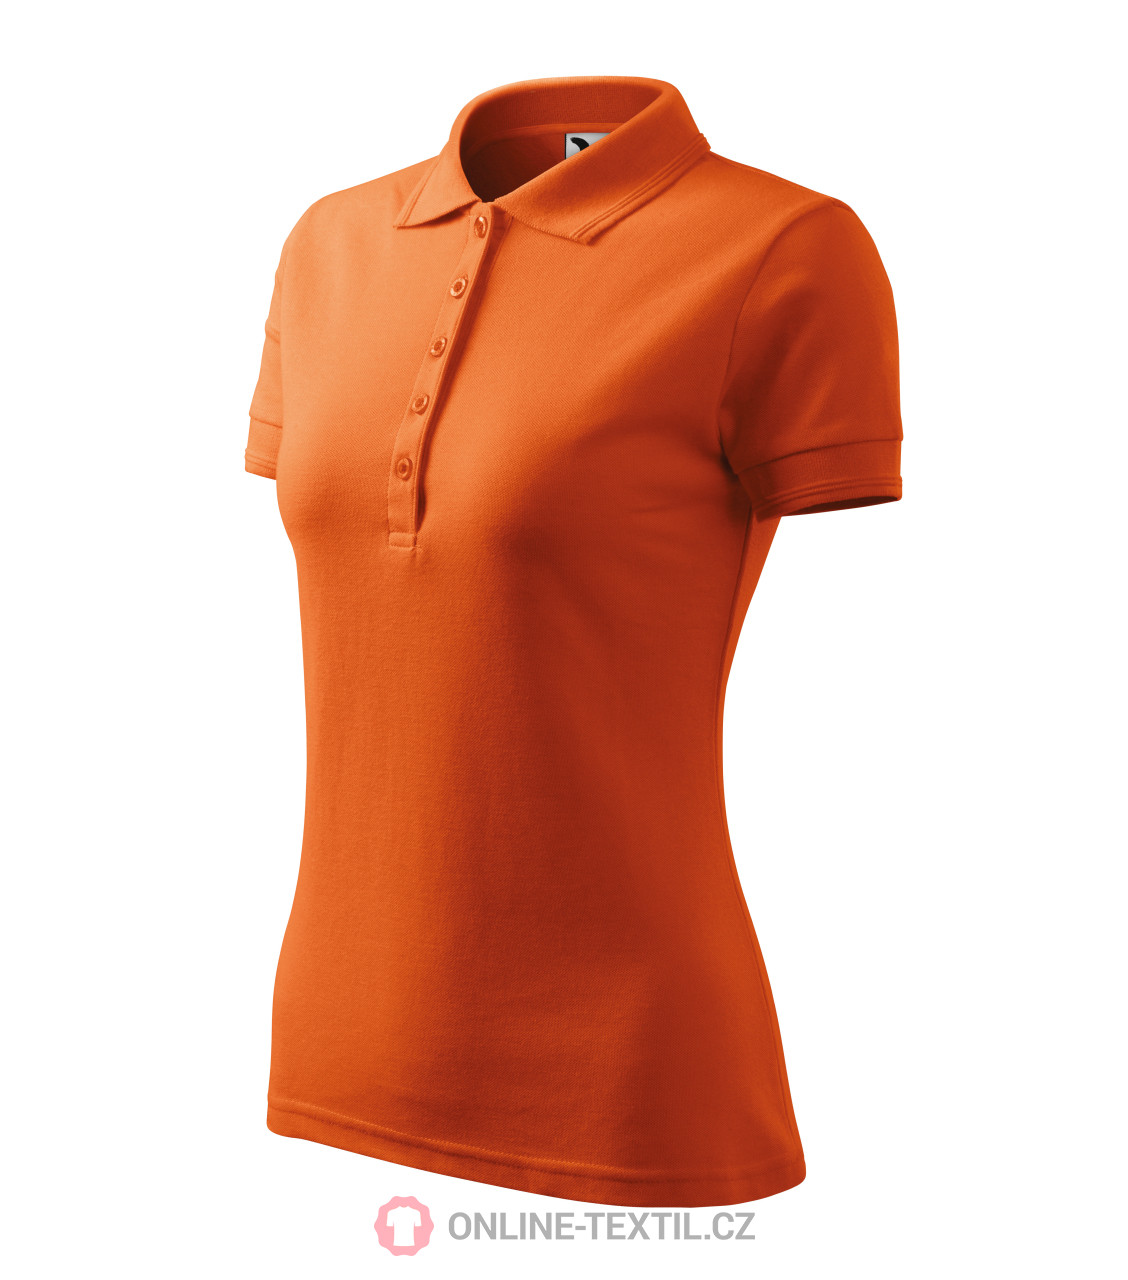 b8ac61aa ADLER CZECH Heavyweight ladies polo shirt Pique Polo 210 - orange ...